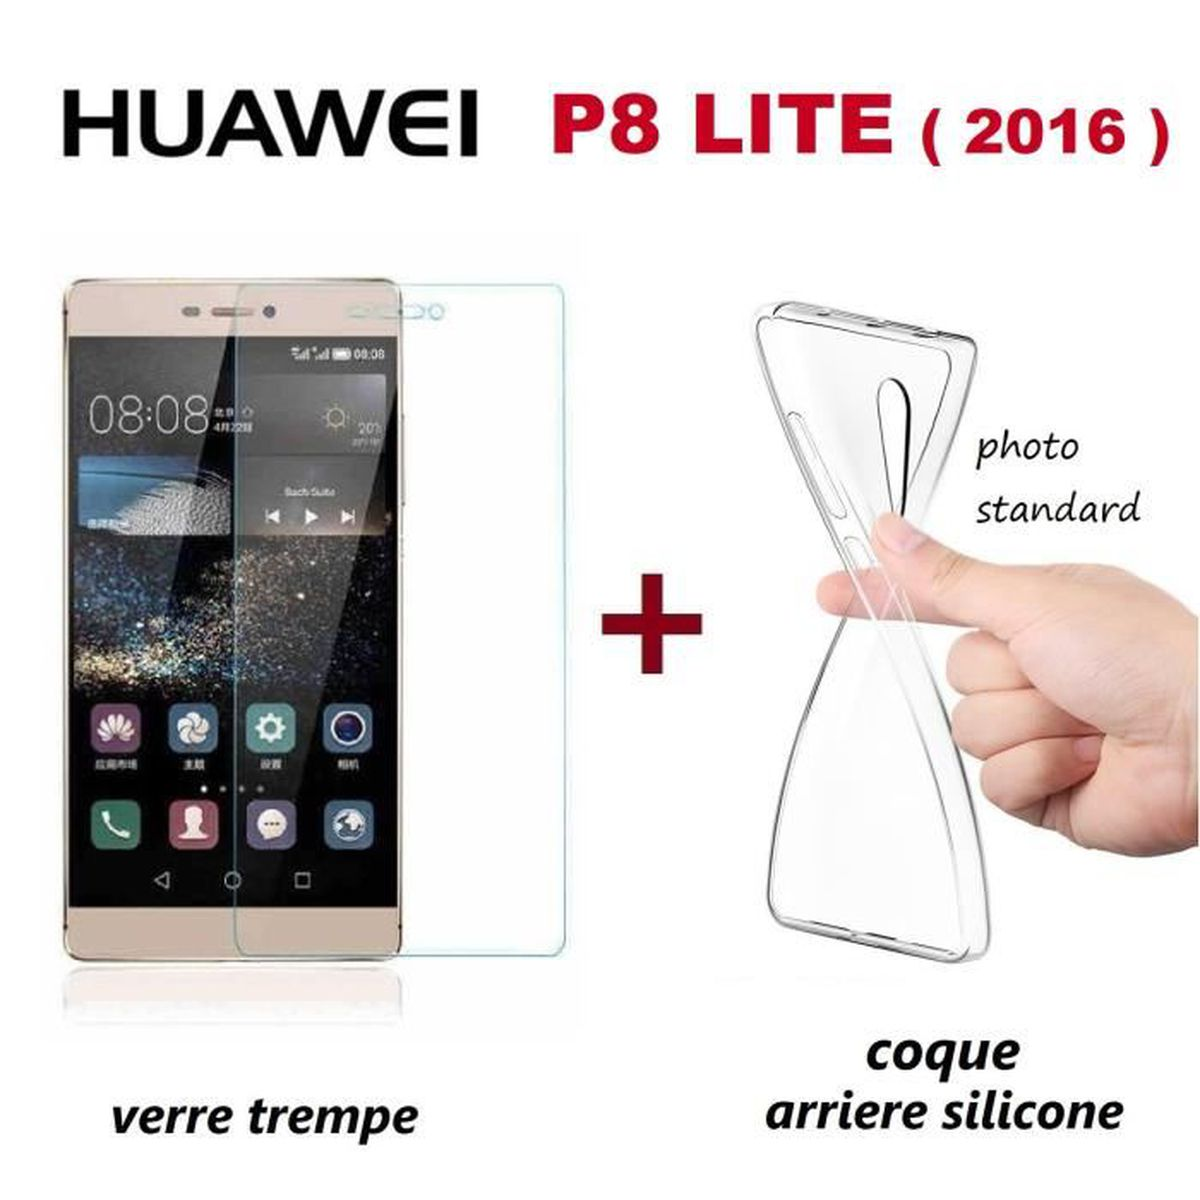 huawei p8 lite 2016 coque silicone